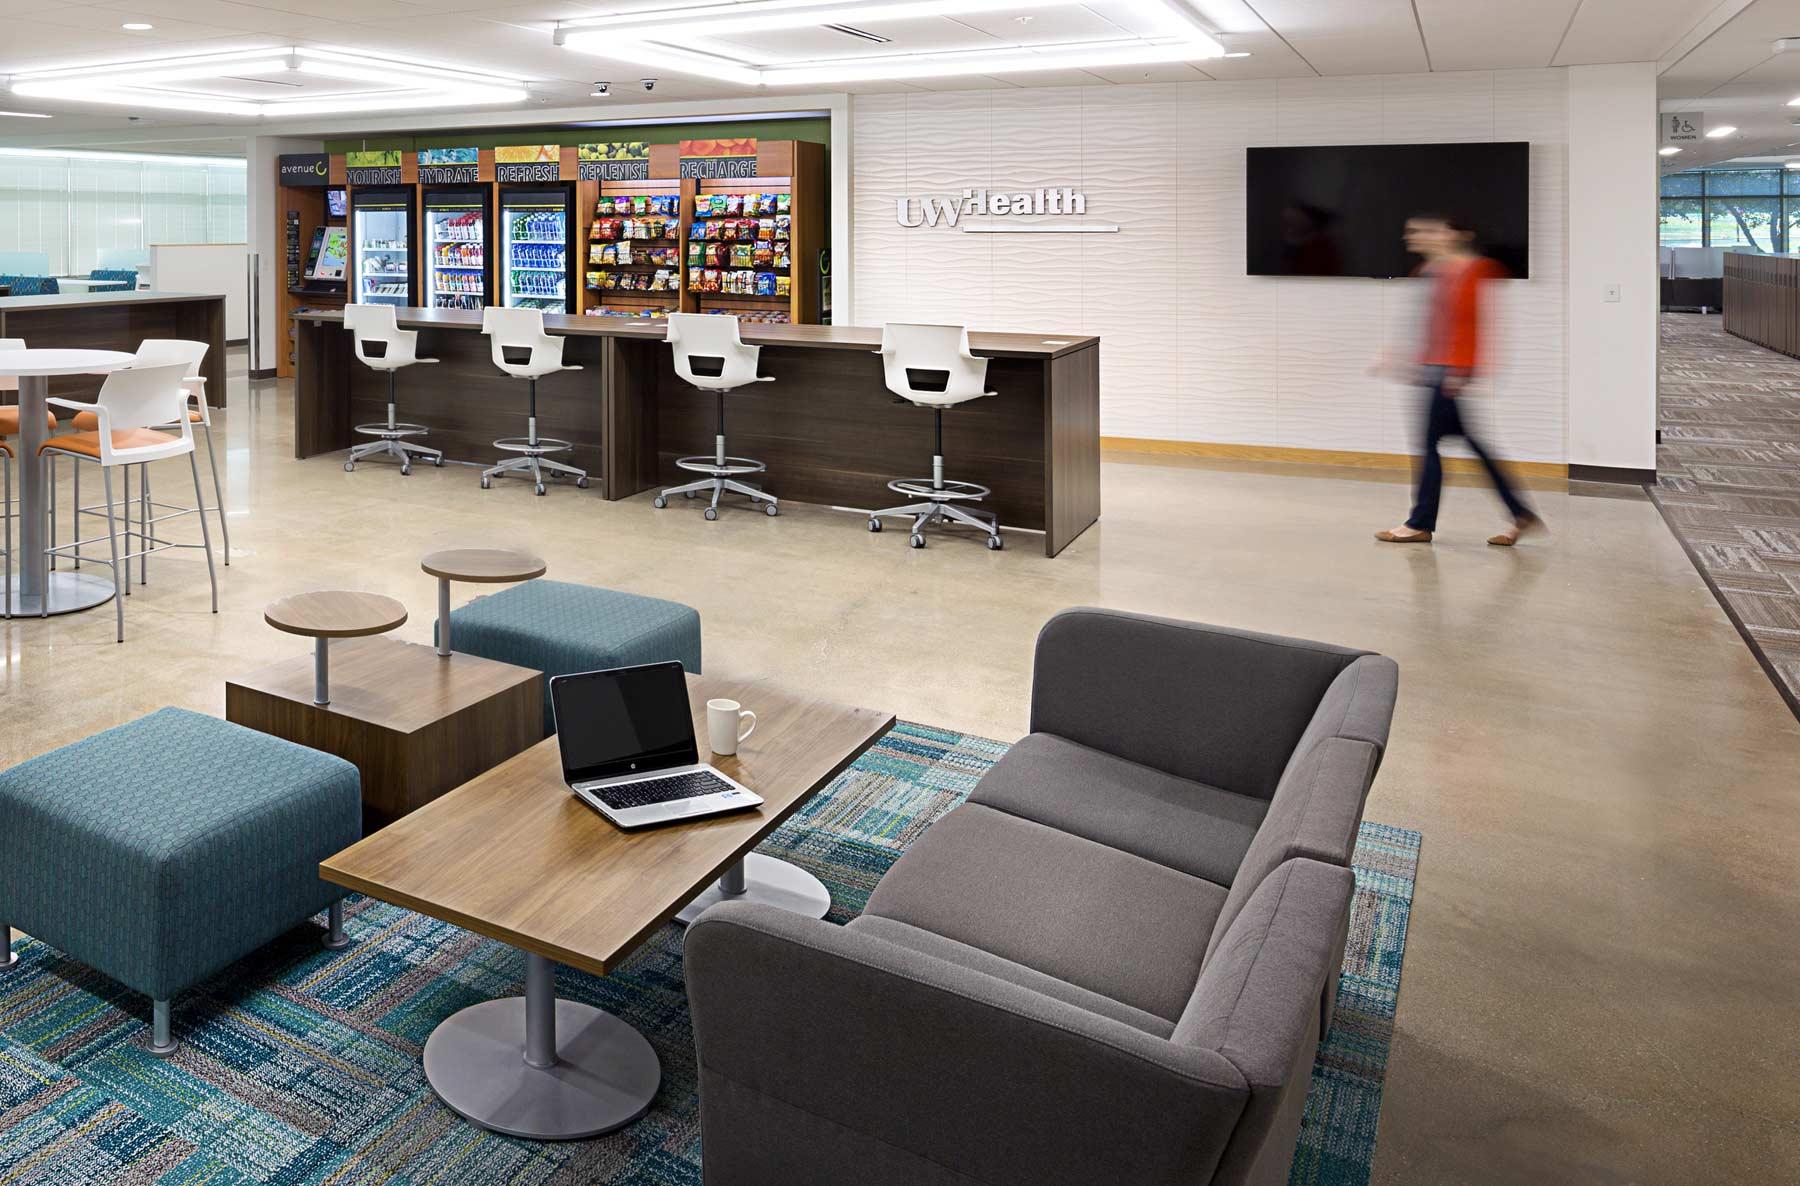 UW Health : Information Services Office